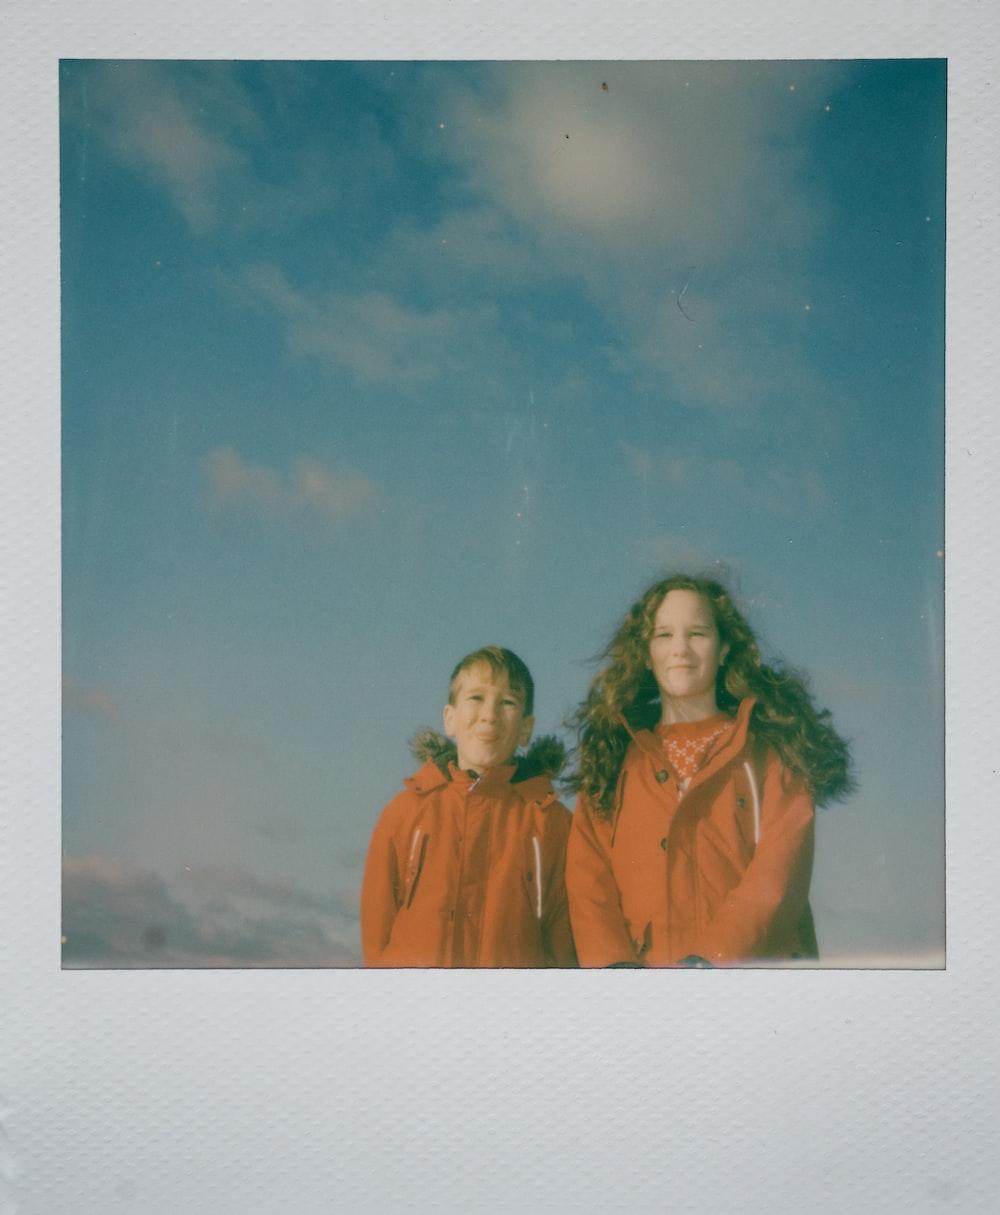 girl and boy wearing orange jackets standing